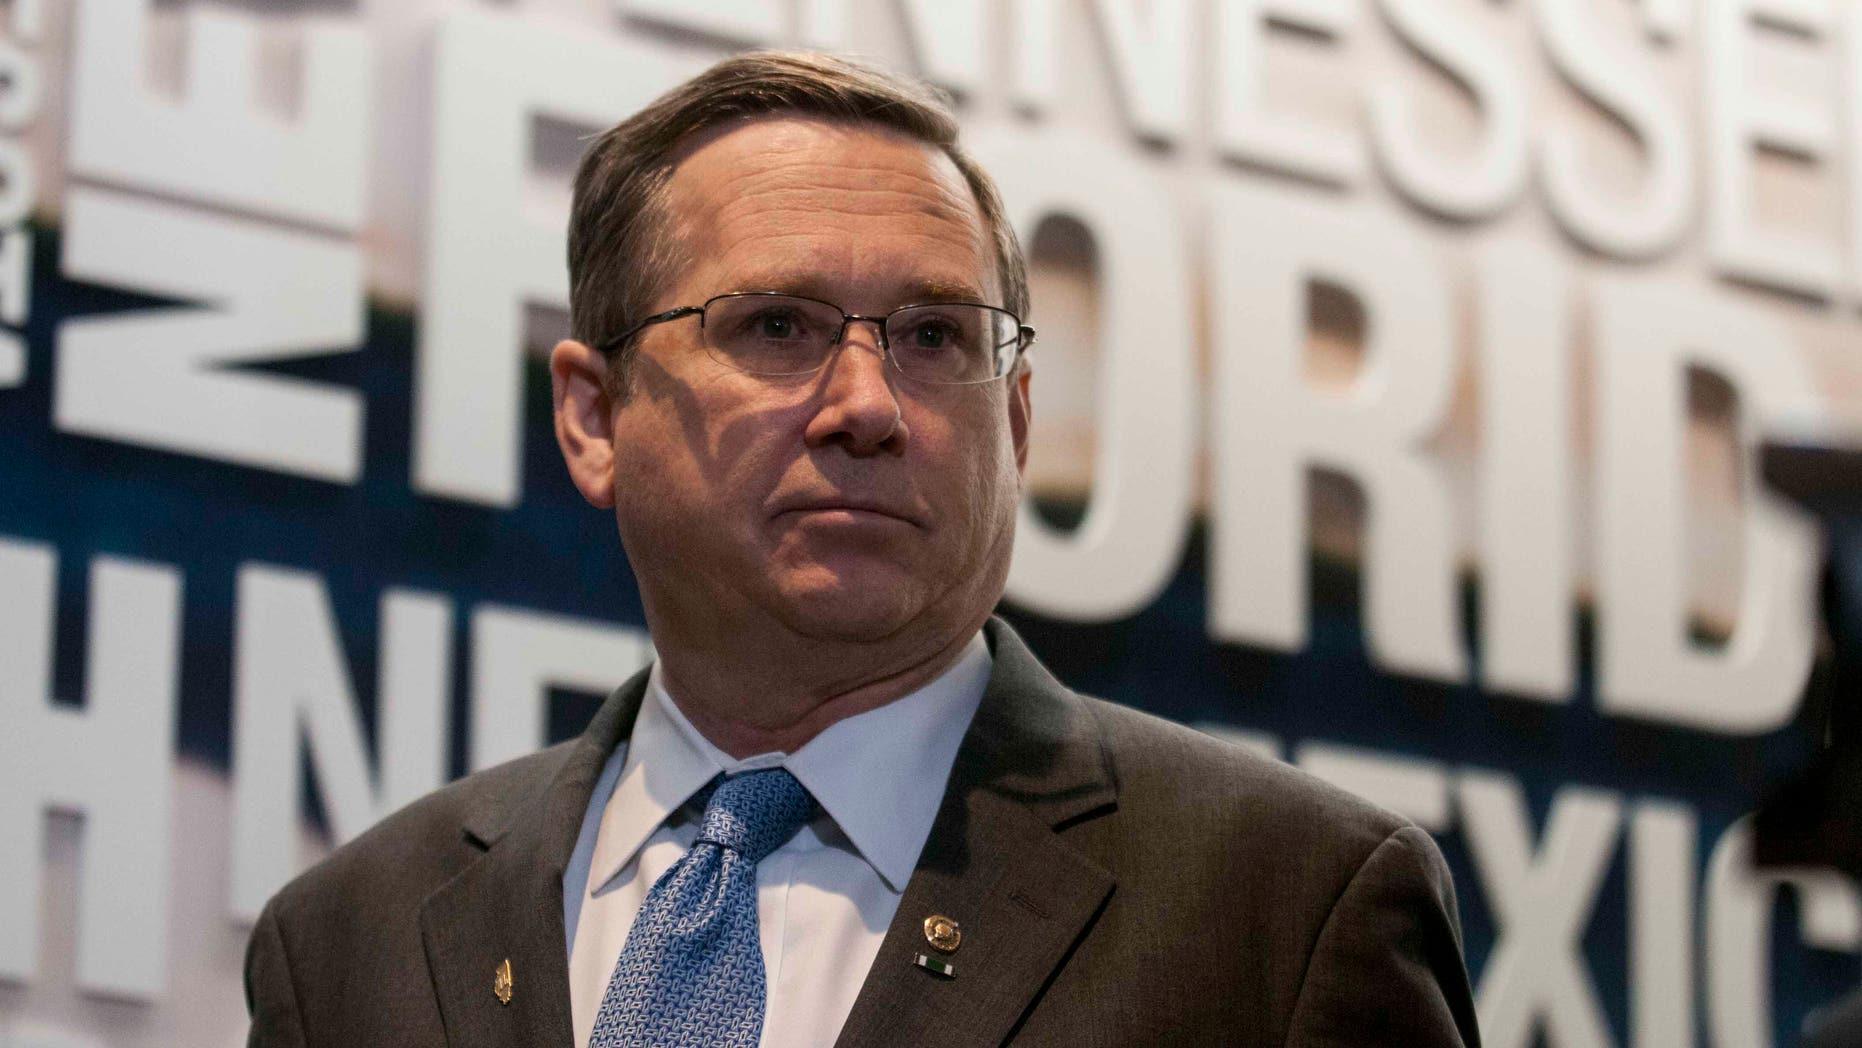 Sen. Mark Kirk on February 9, 2016 in Washington, DC.